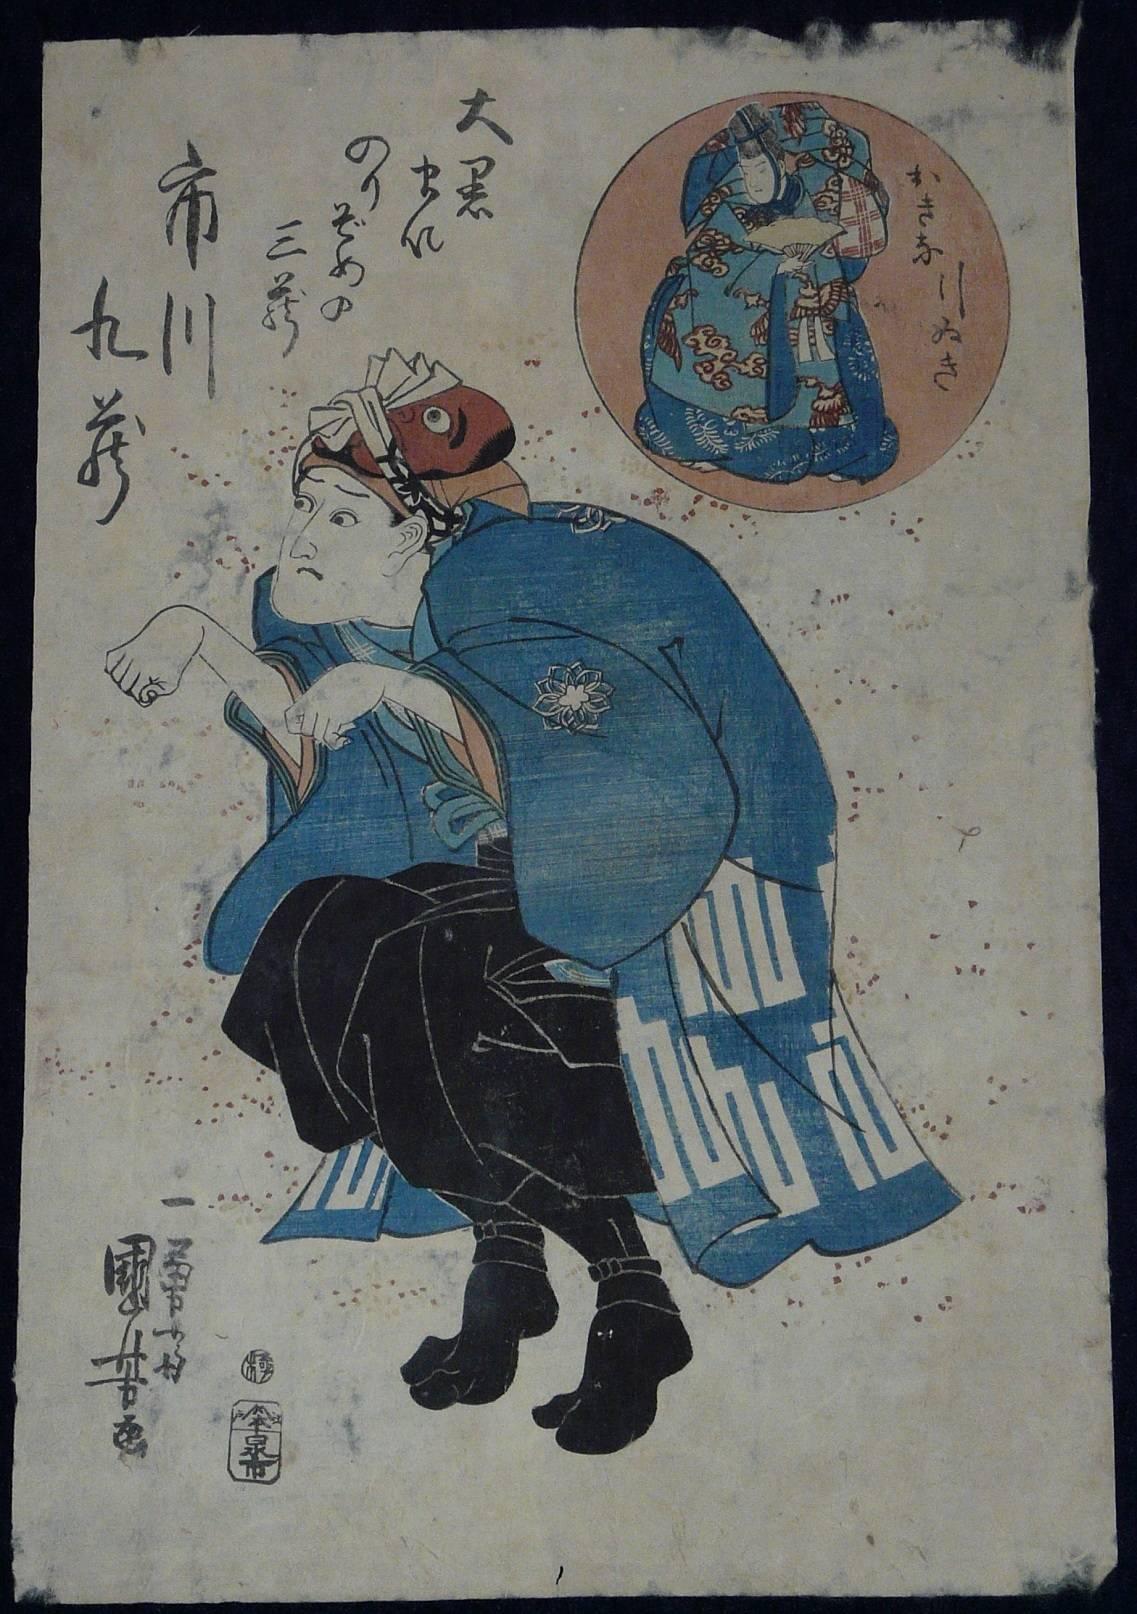 UTAGAWA KUNIYOSHI: #P2376 A VERY RARE EARLY SCENE Circa 1830